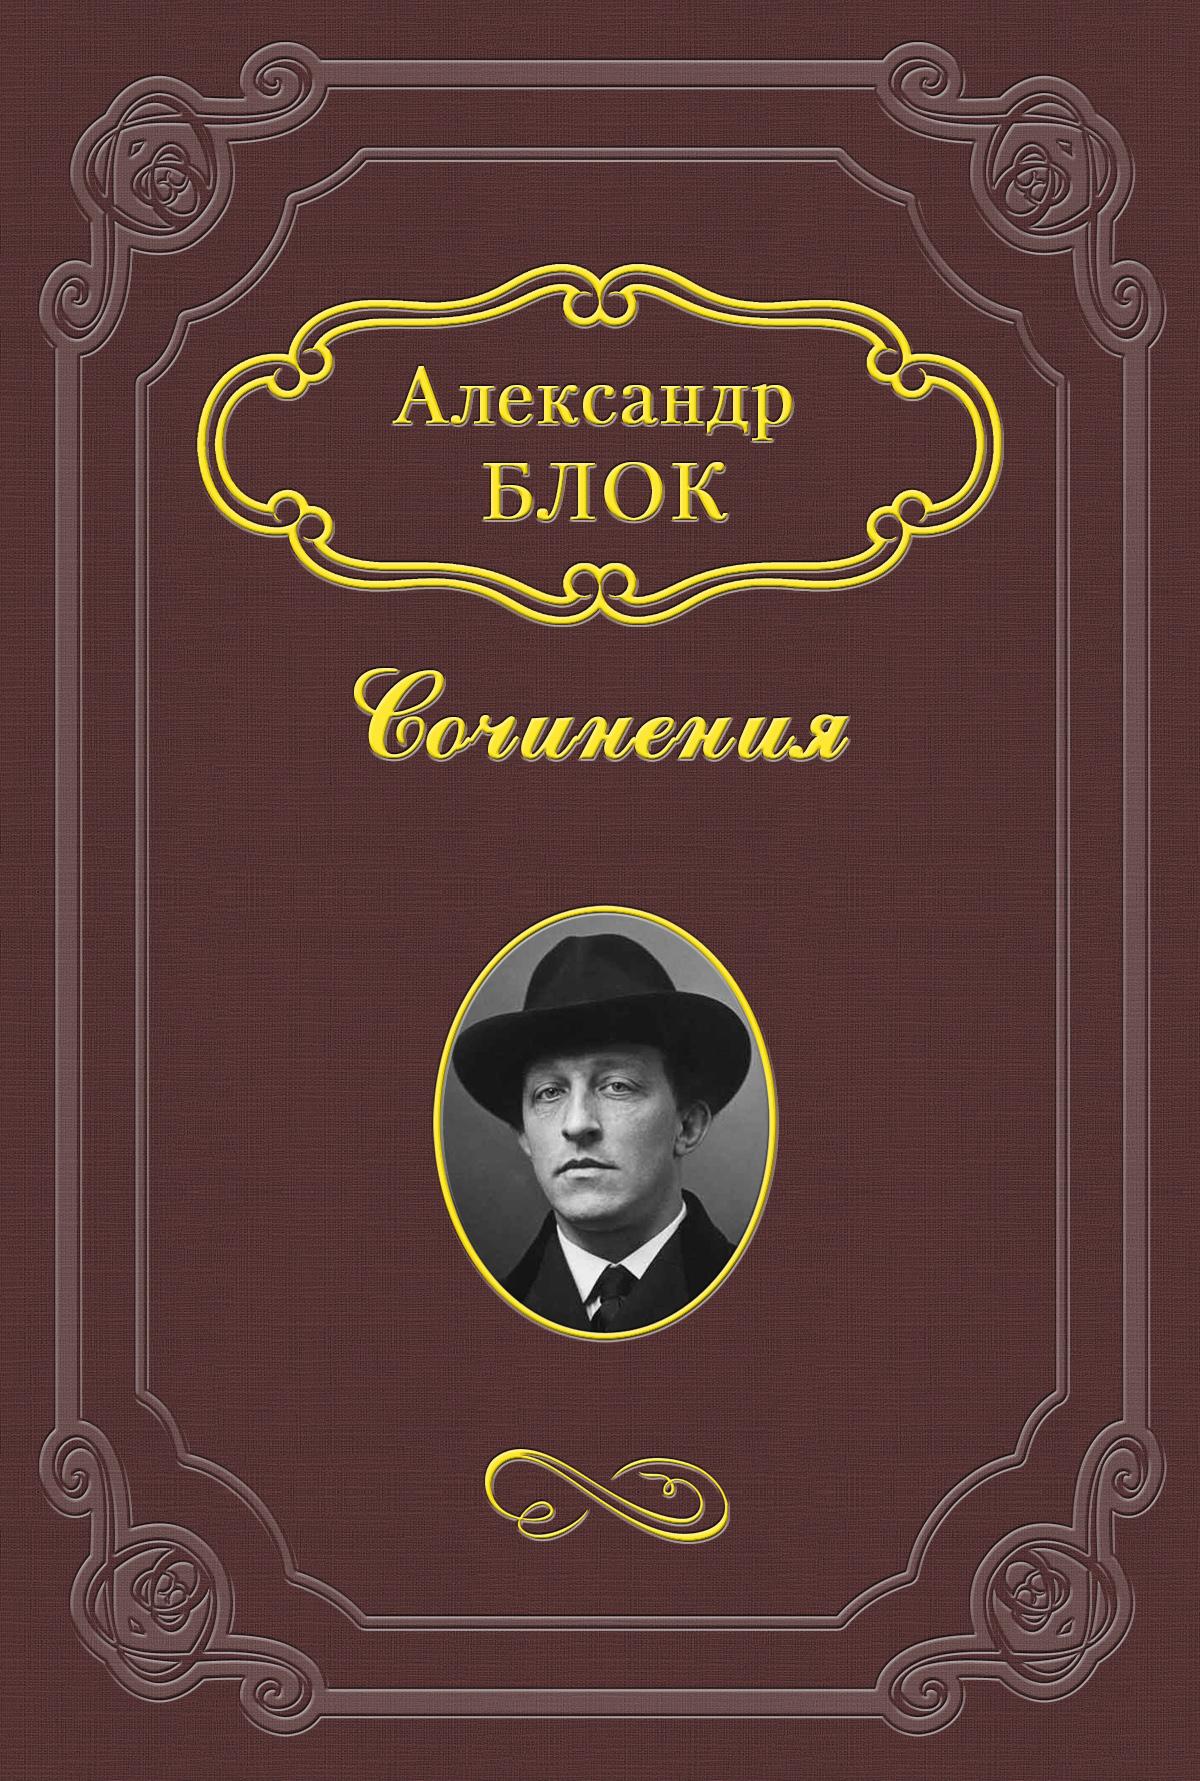 Александр Блок Балаганчик free shipping 10pcs tua2019 5x